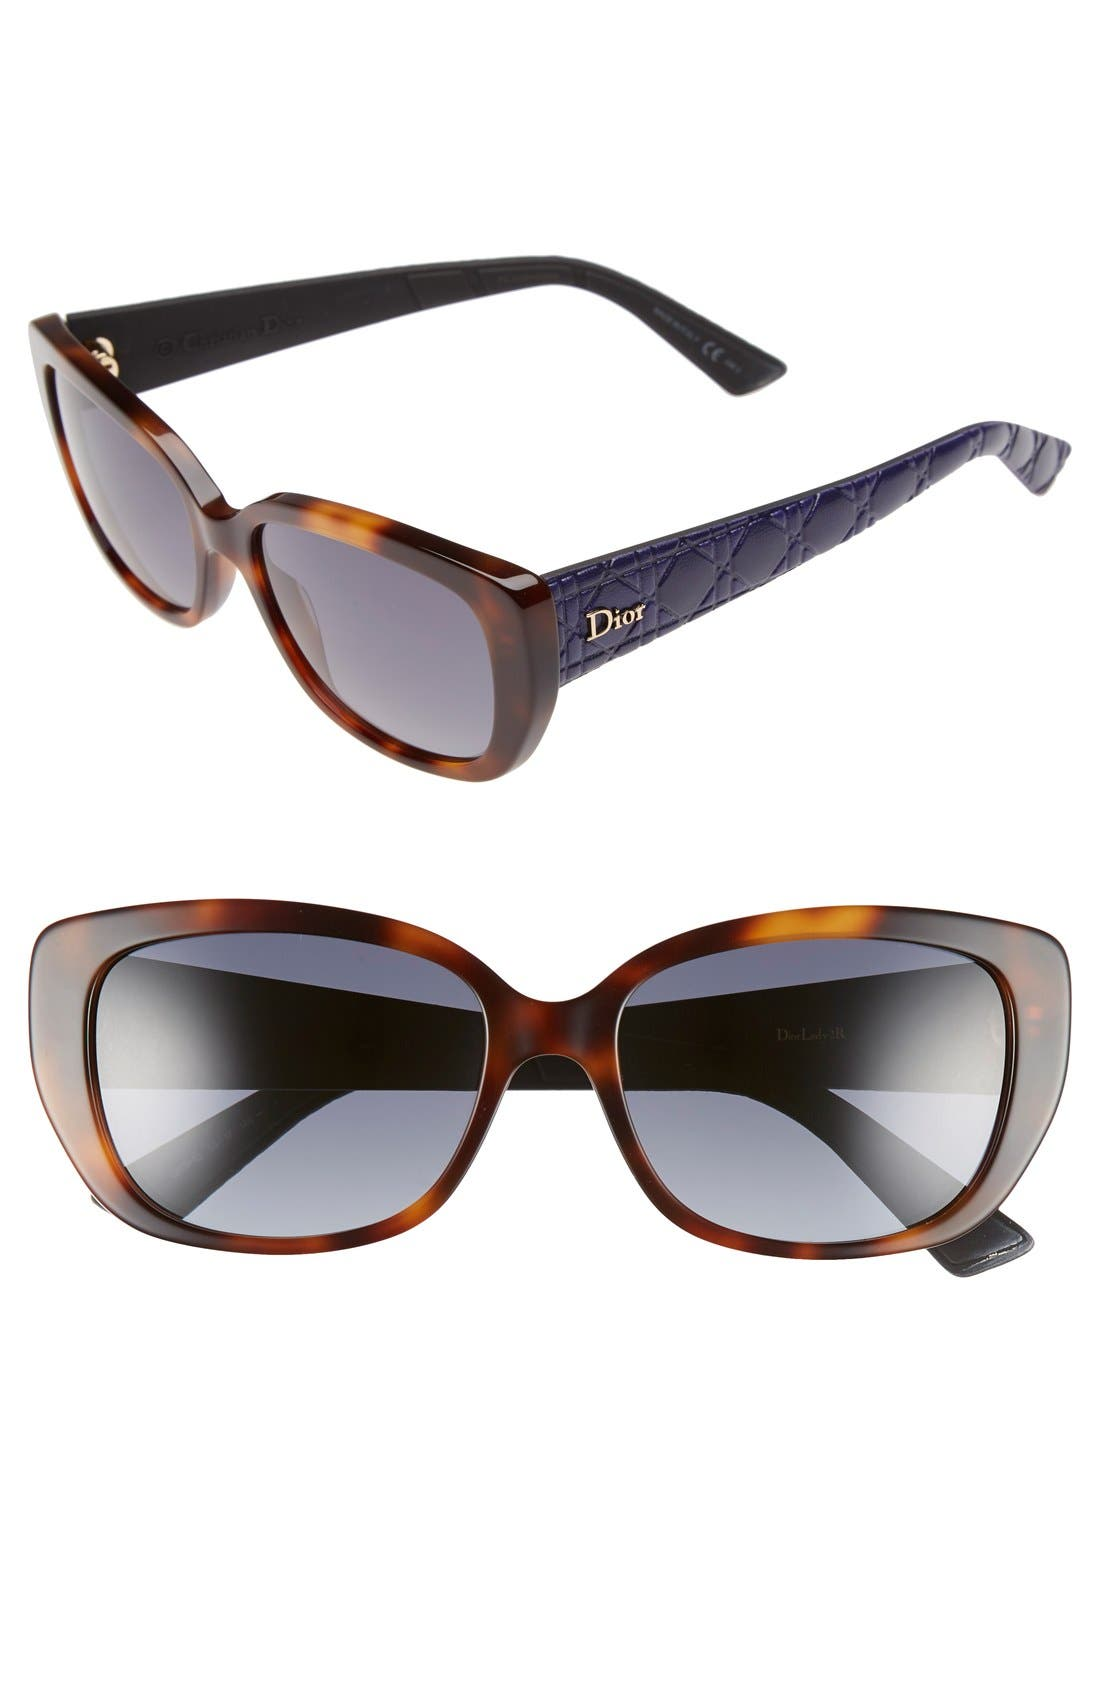 Lady 55mm Cat Eye Sunglasses,                         Main,                         color, 200